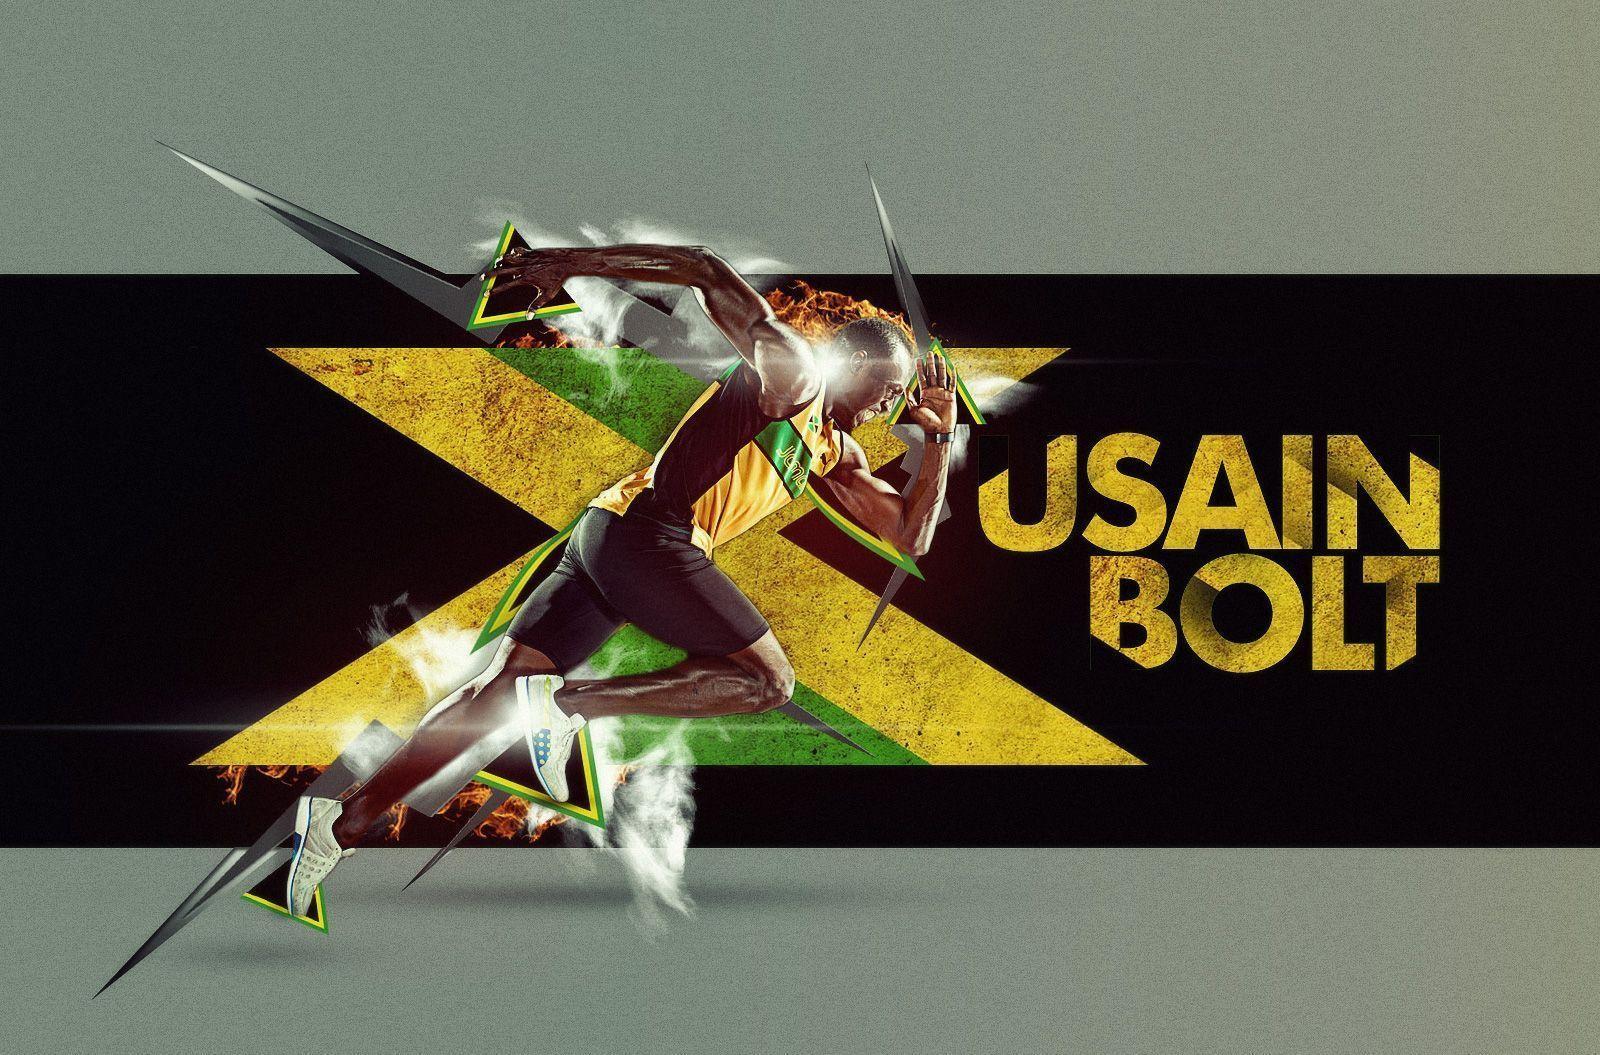 Usain Bolt Wallpaper - Viewing Gallery